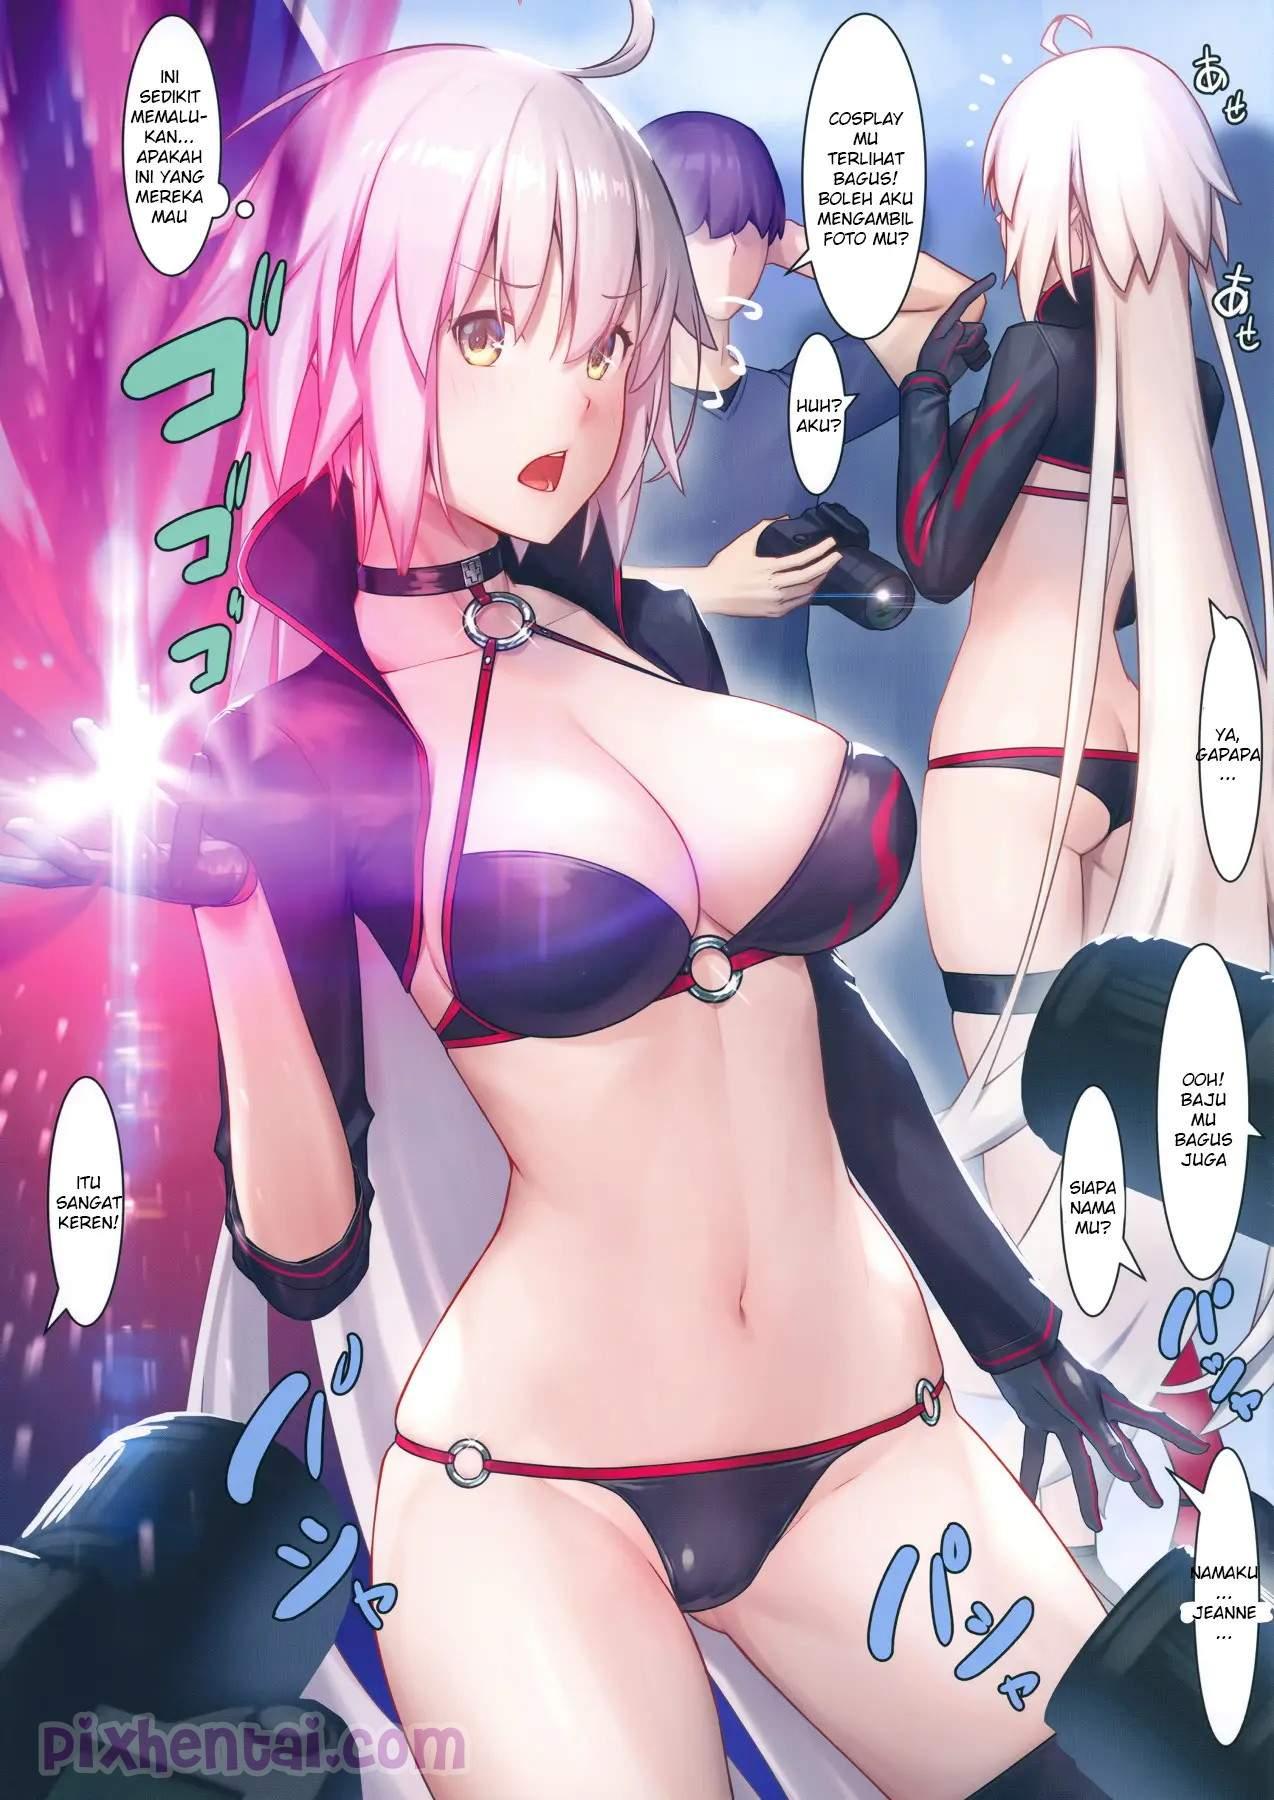 Cosplayer dientot di depan umum Komik hentai xxx manga sex bokep 04